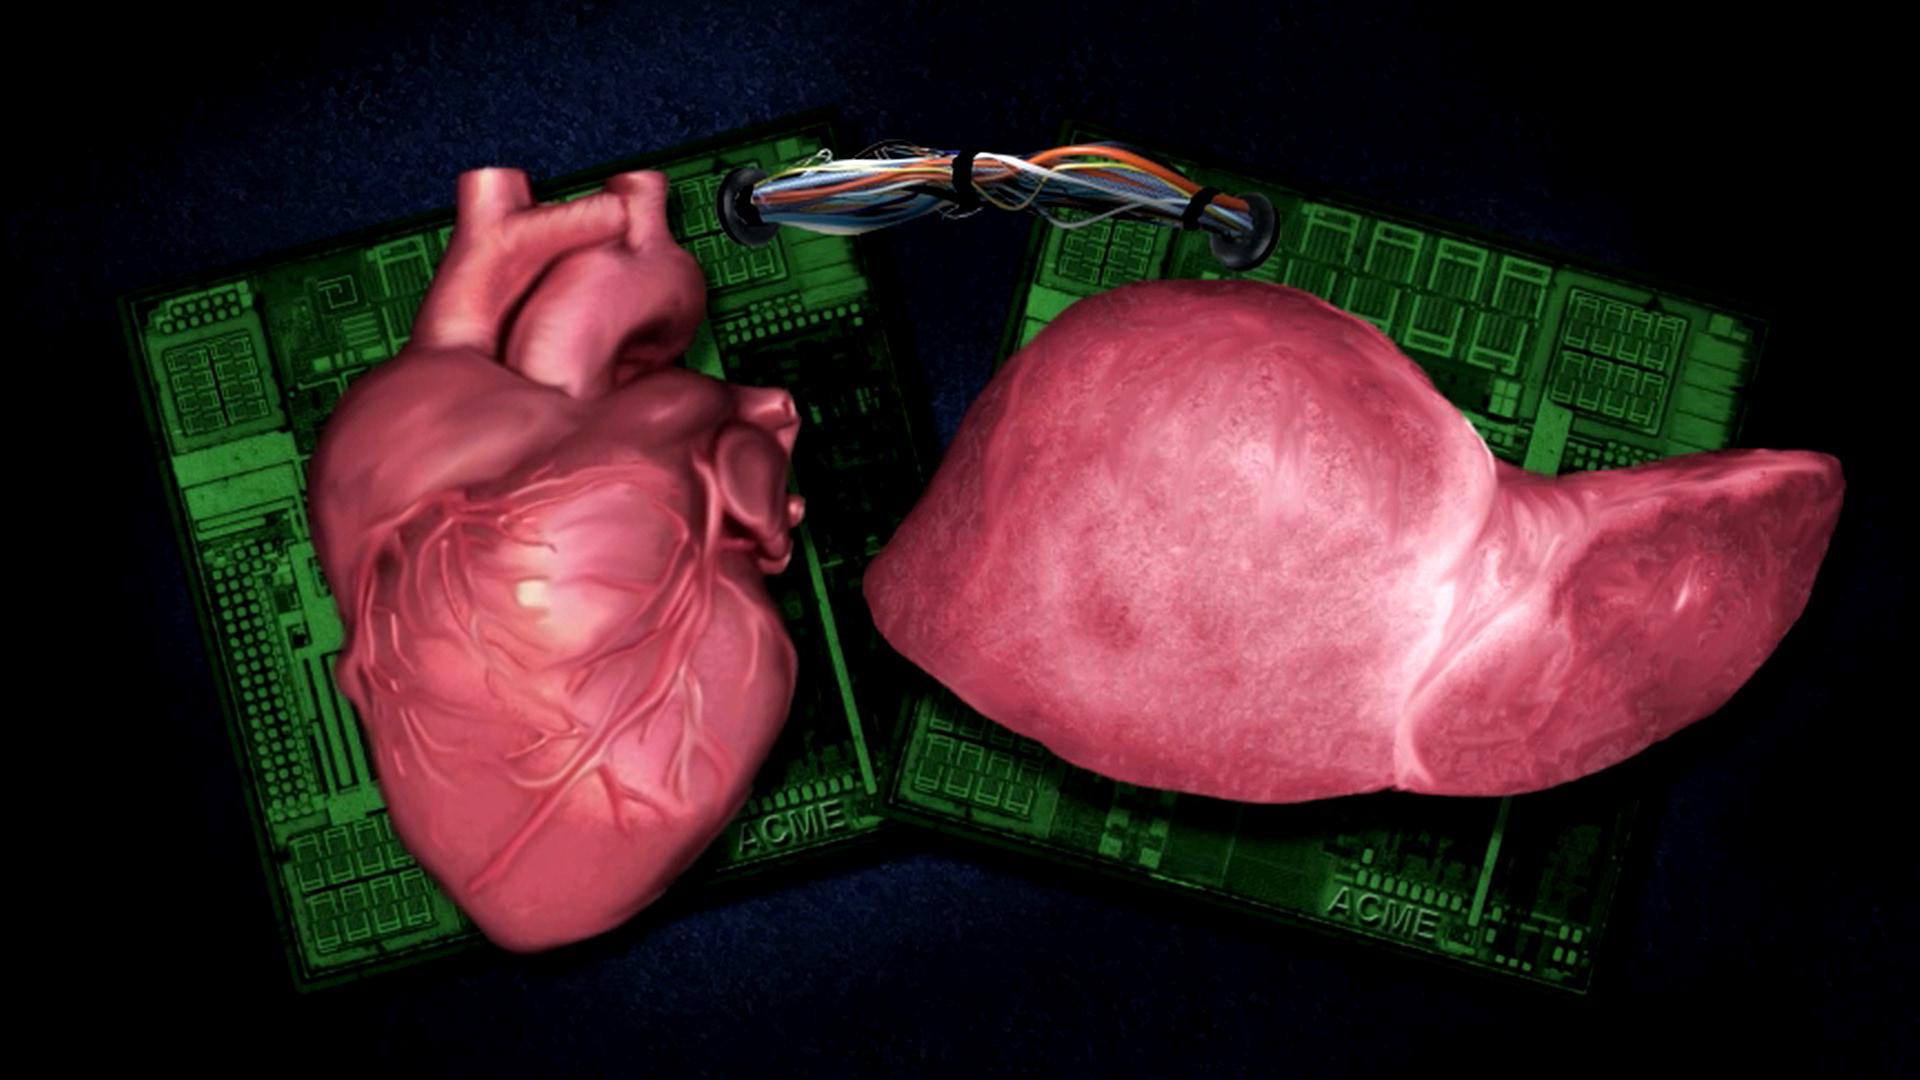 Cloned organs